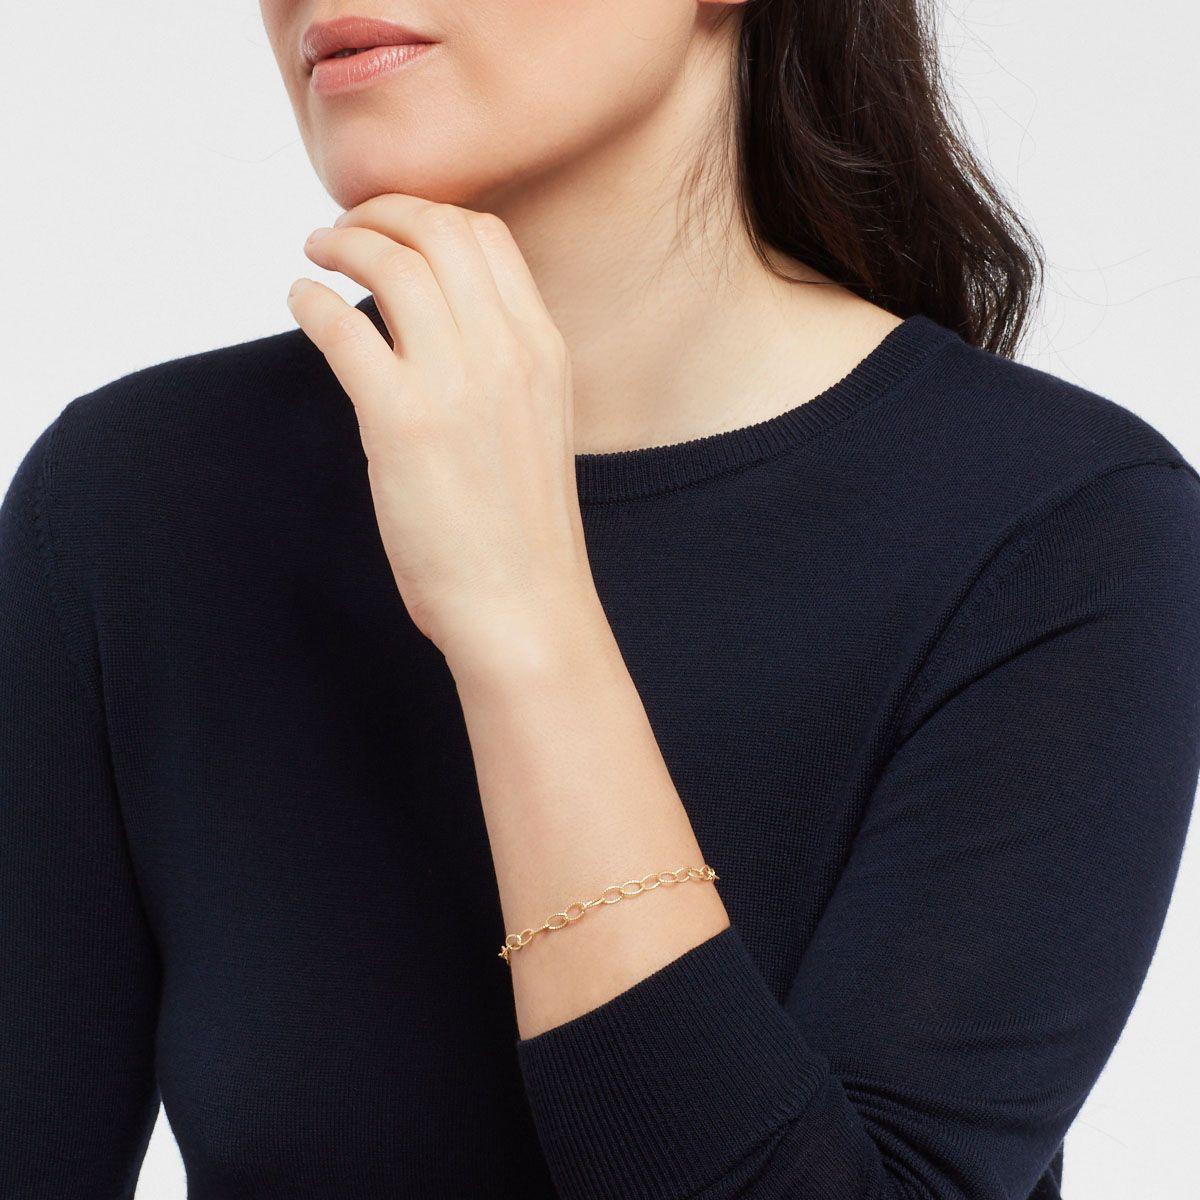 Maude - Armband - Silber